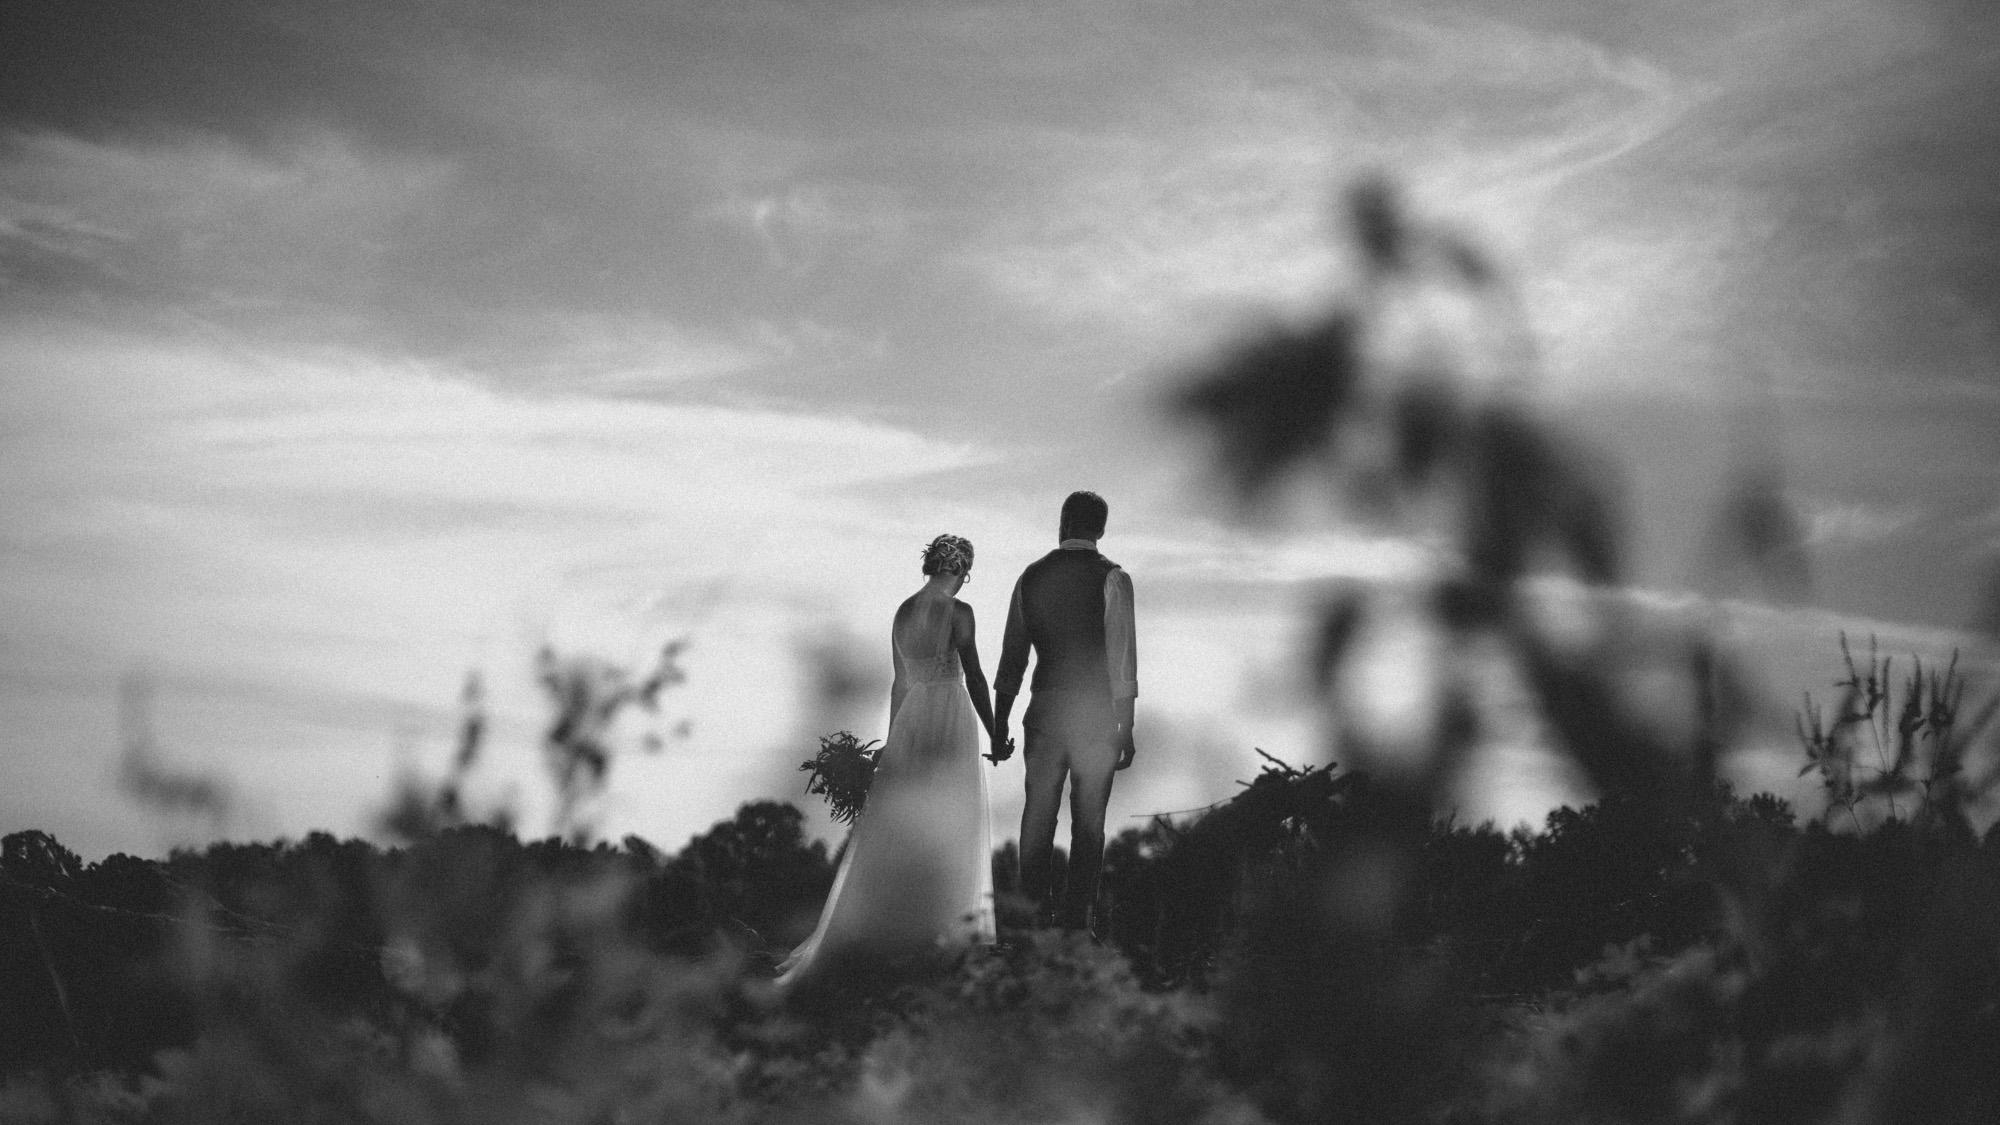 alec_vanderboom_springfield_missouri_wedding-0046.jpg